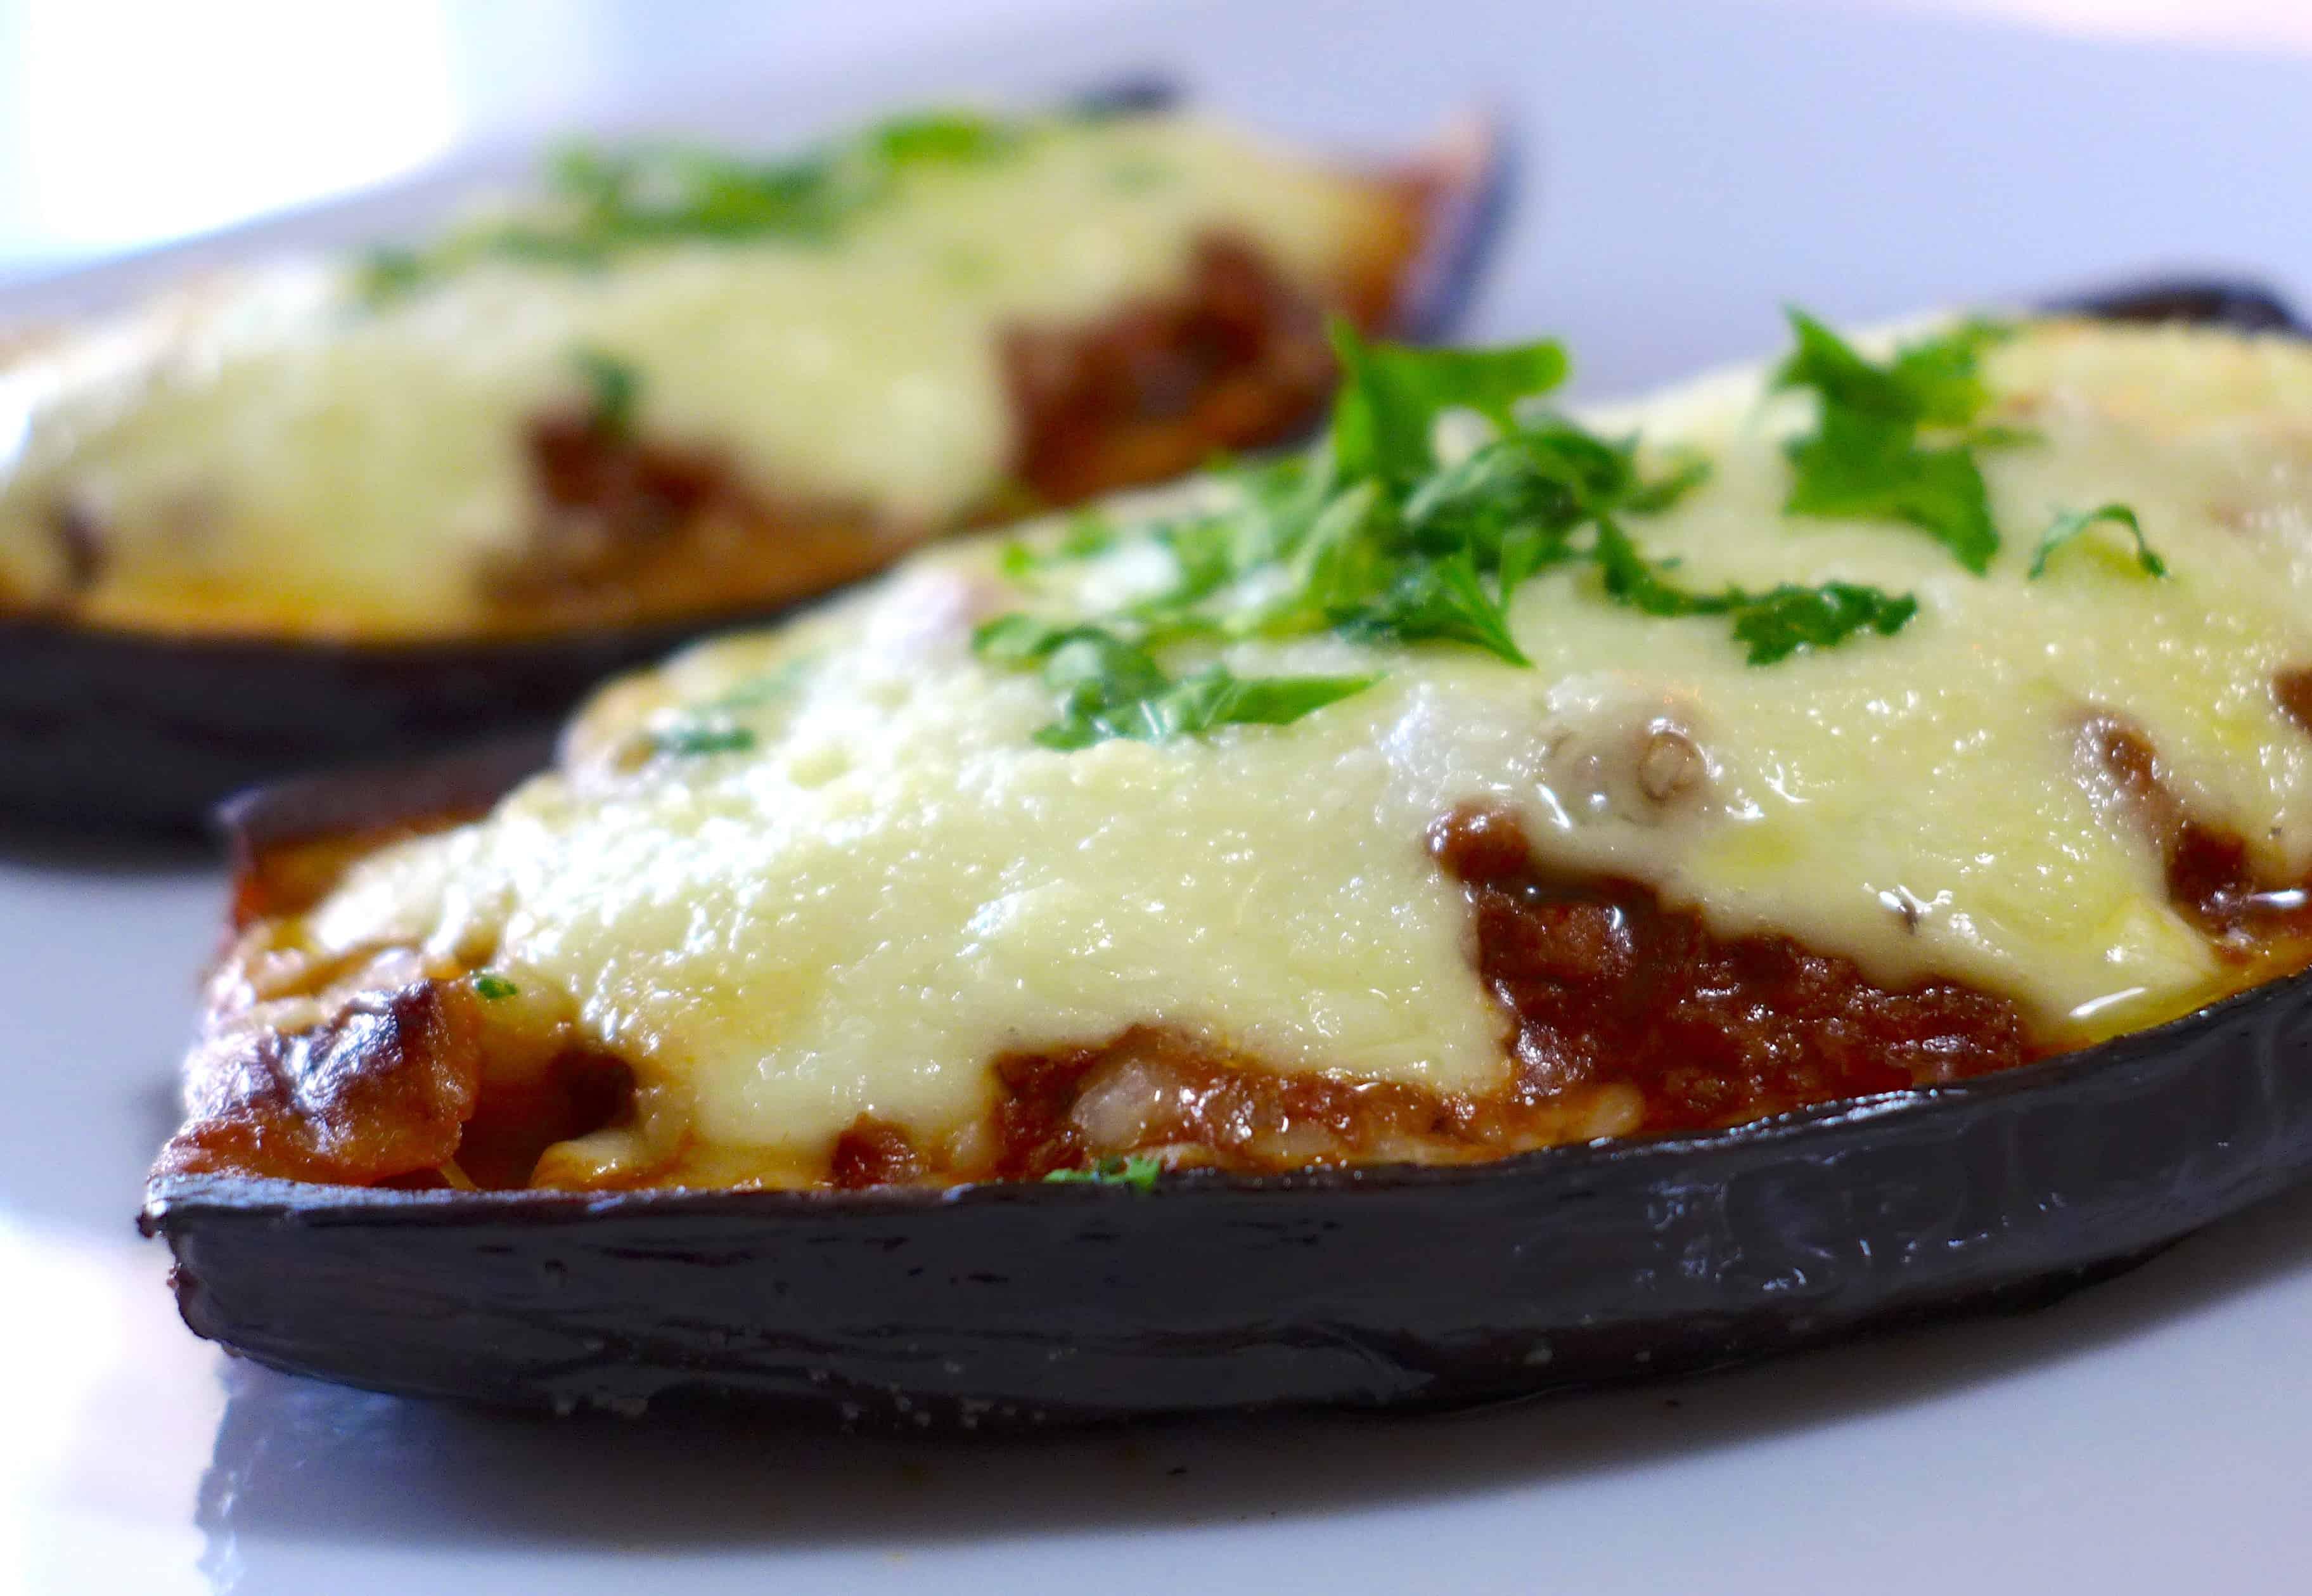 ... eggplant pasta eggplant parmesan eggplant cannelloni eggplant thoran